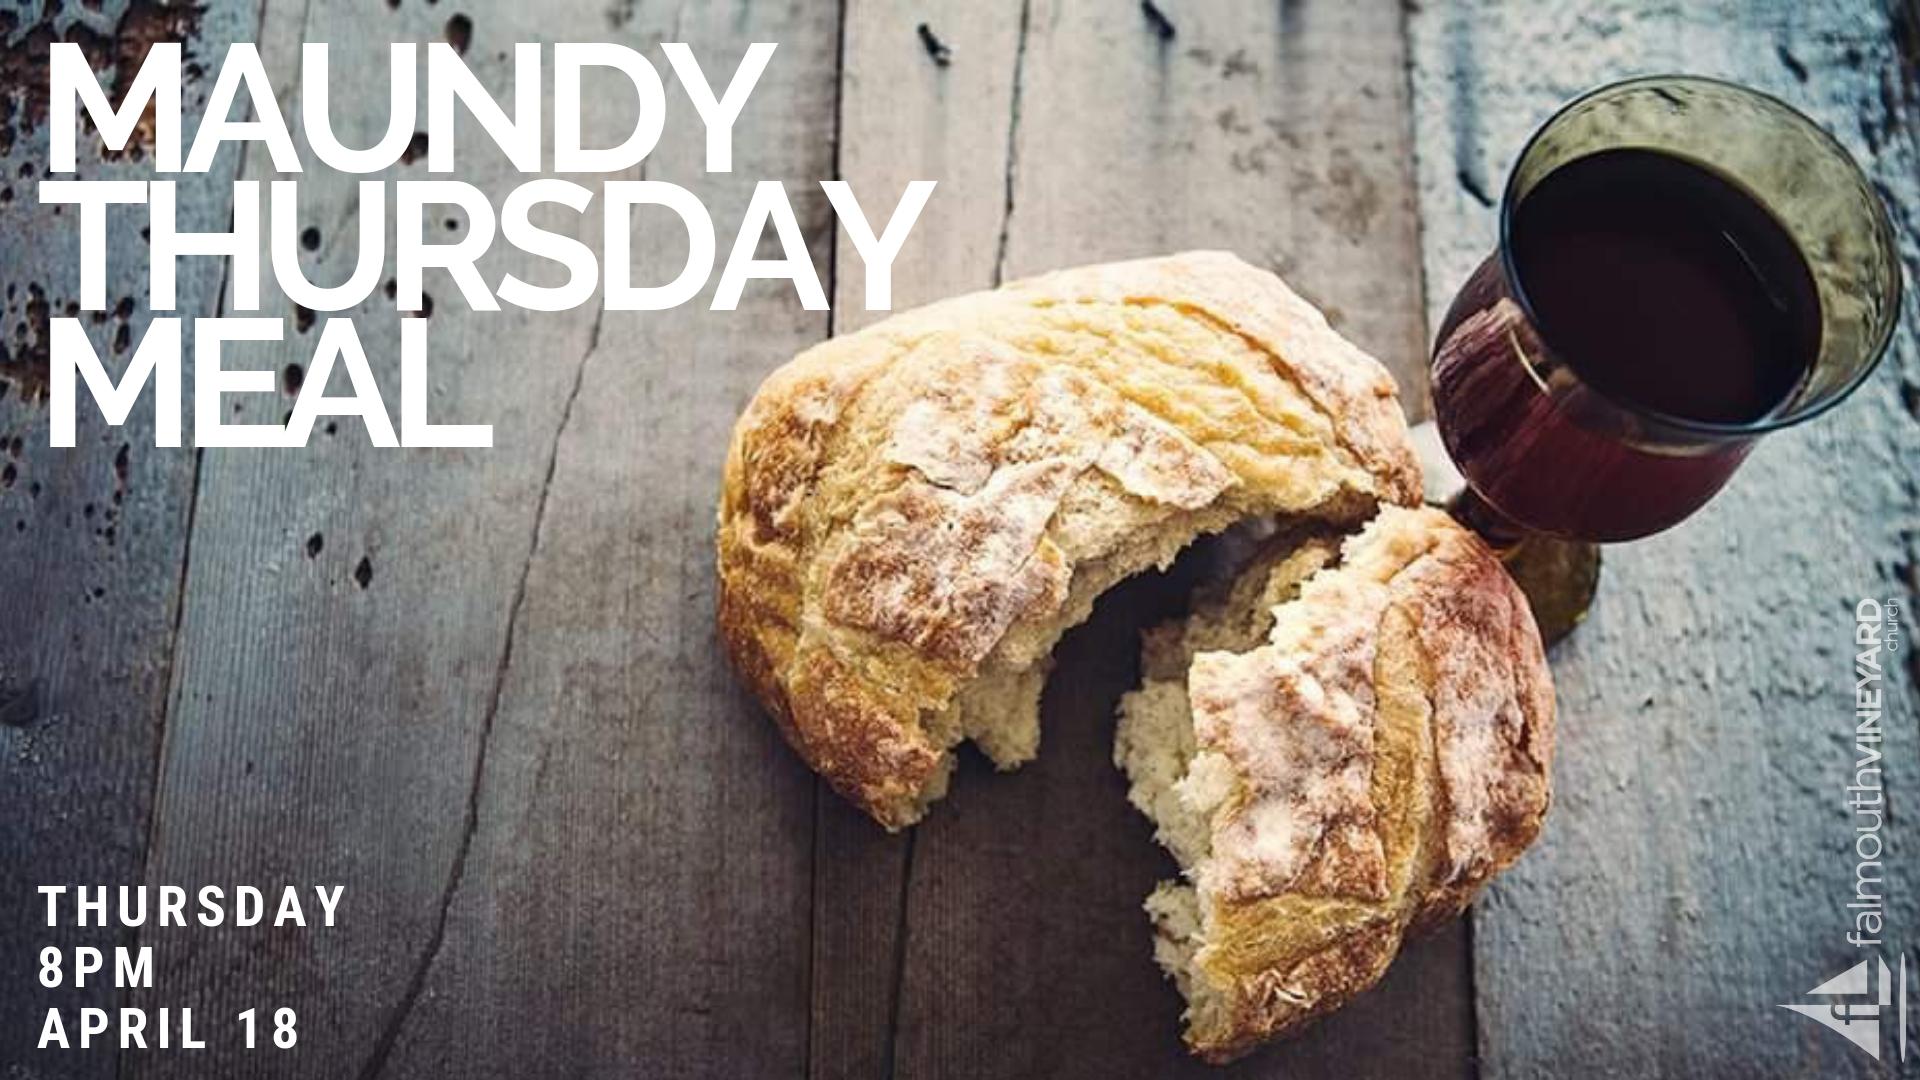 Maundy Thursday Meal